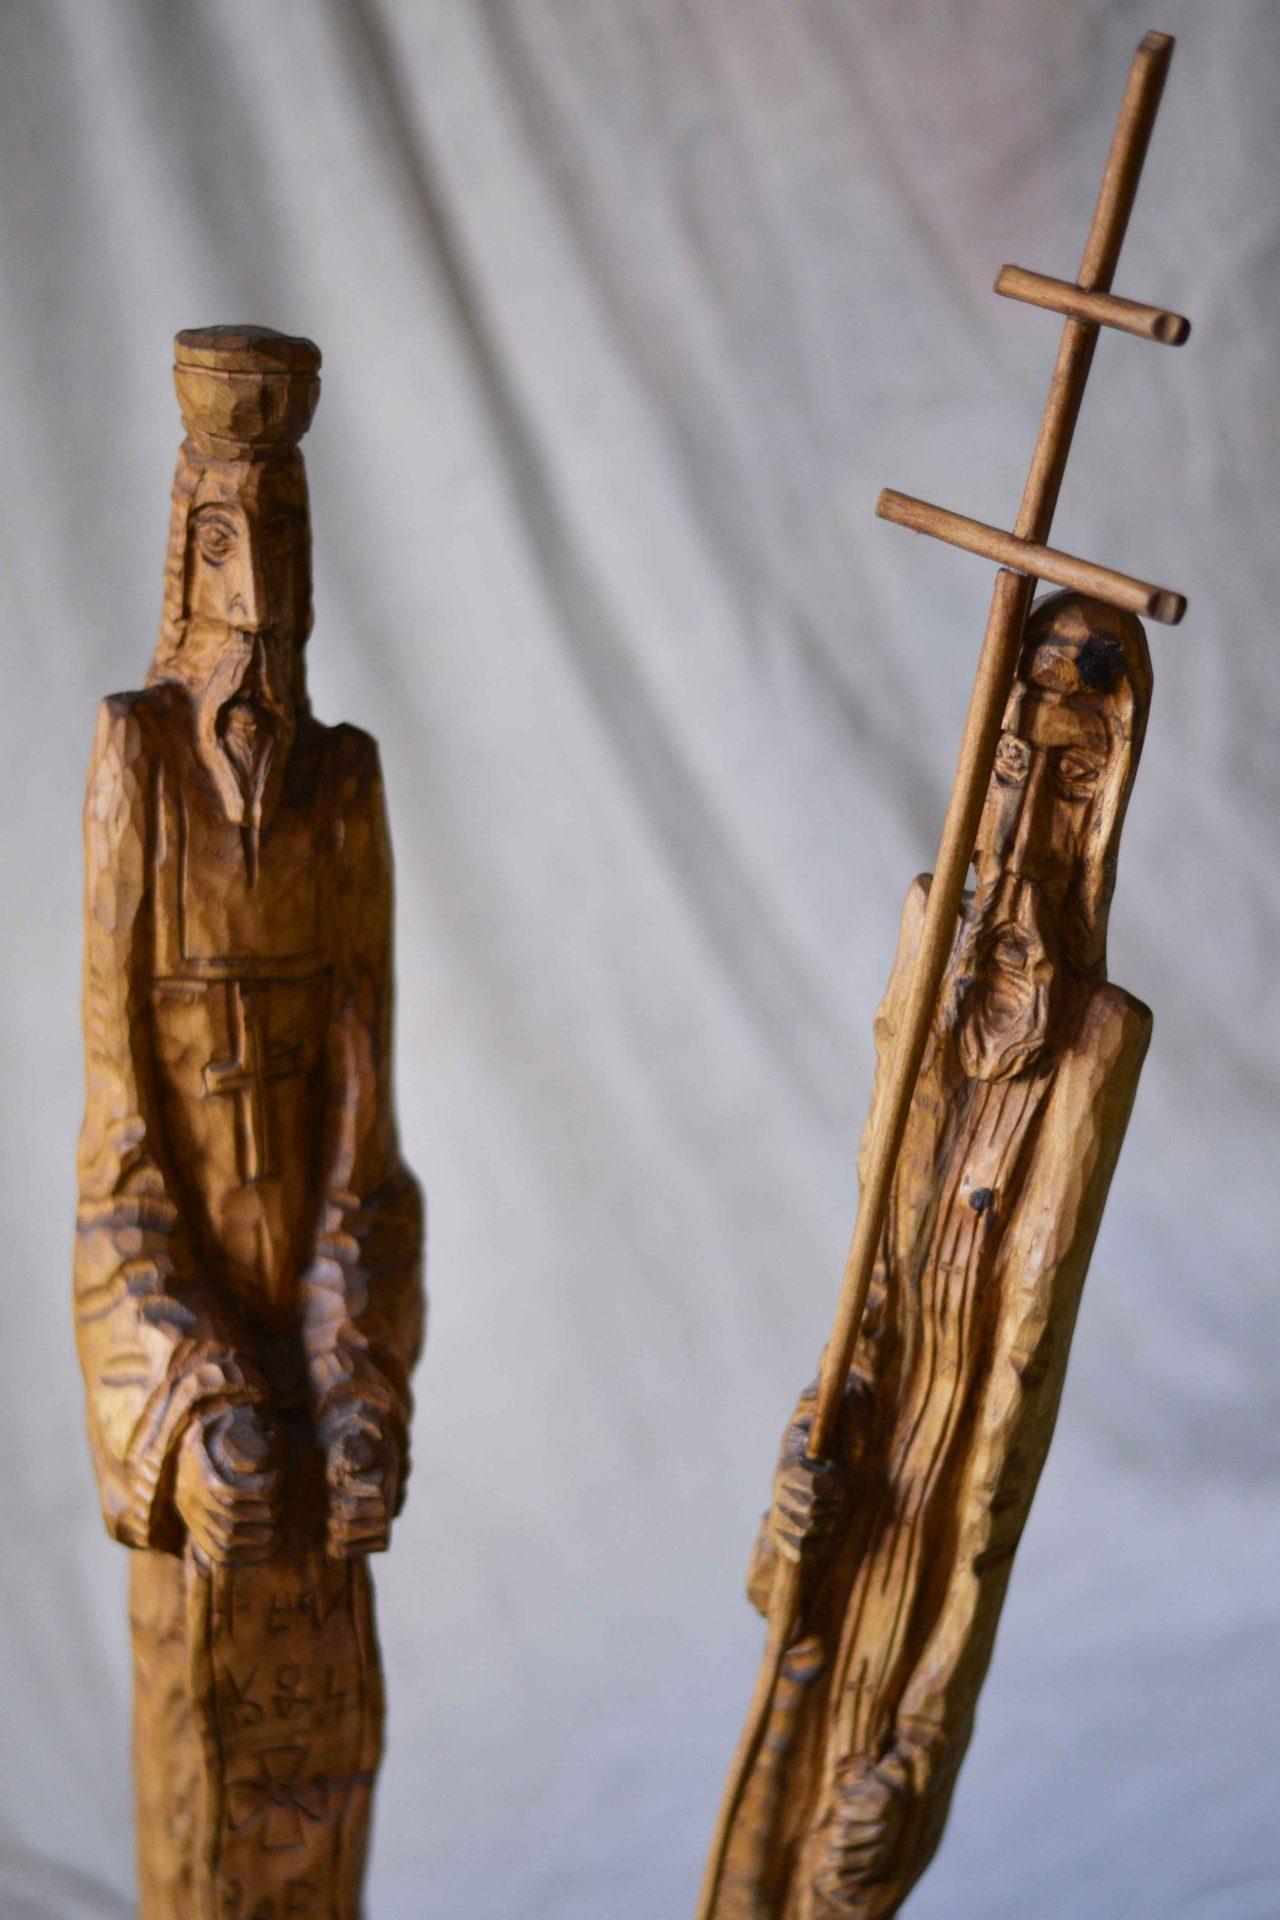 drevena-socha-drevorezba-vierozvestci